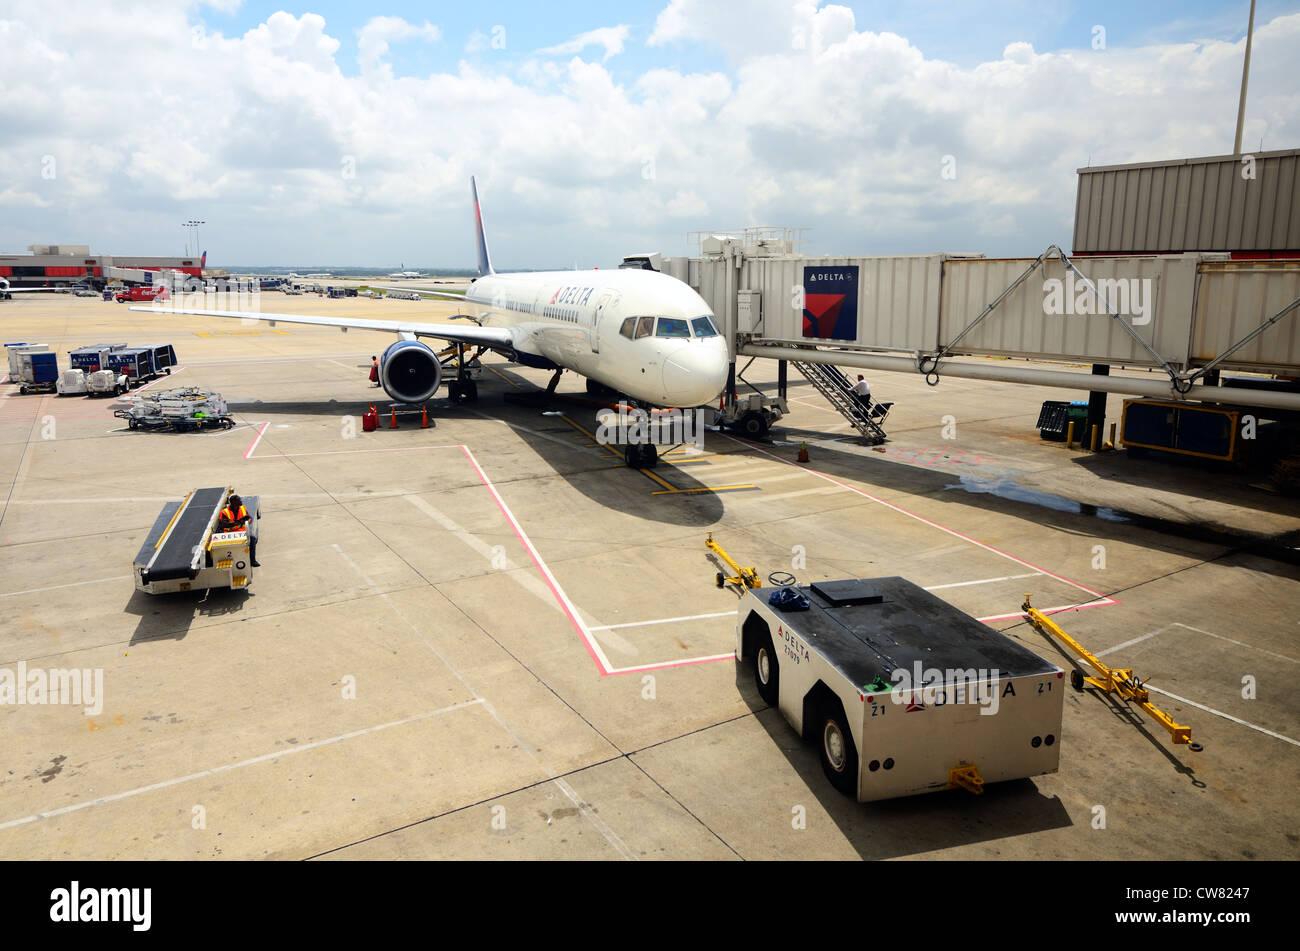 Delta Jet docked at the gate in Hartsfield-Jackson Atlanta International Airport - Stock Image